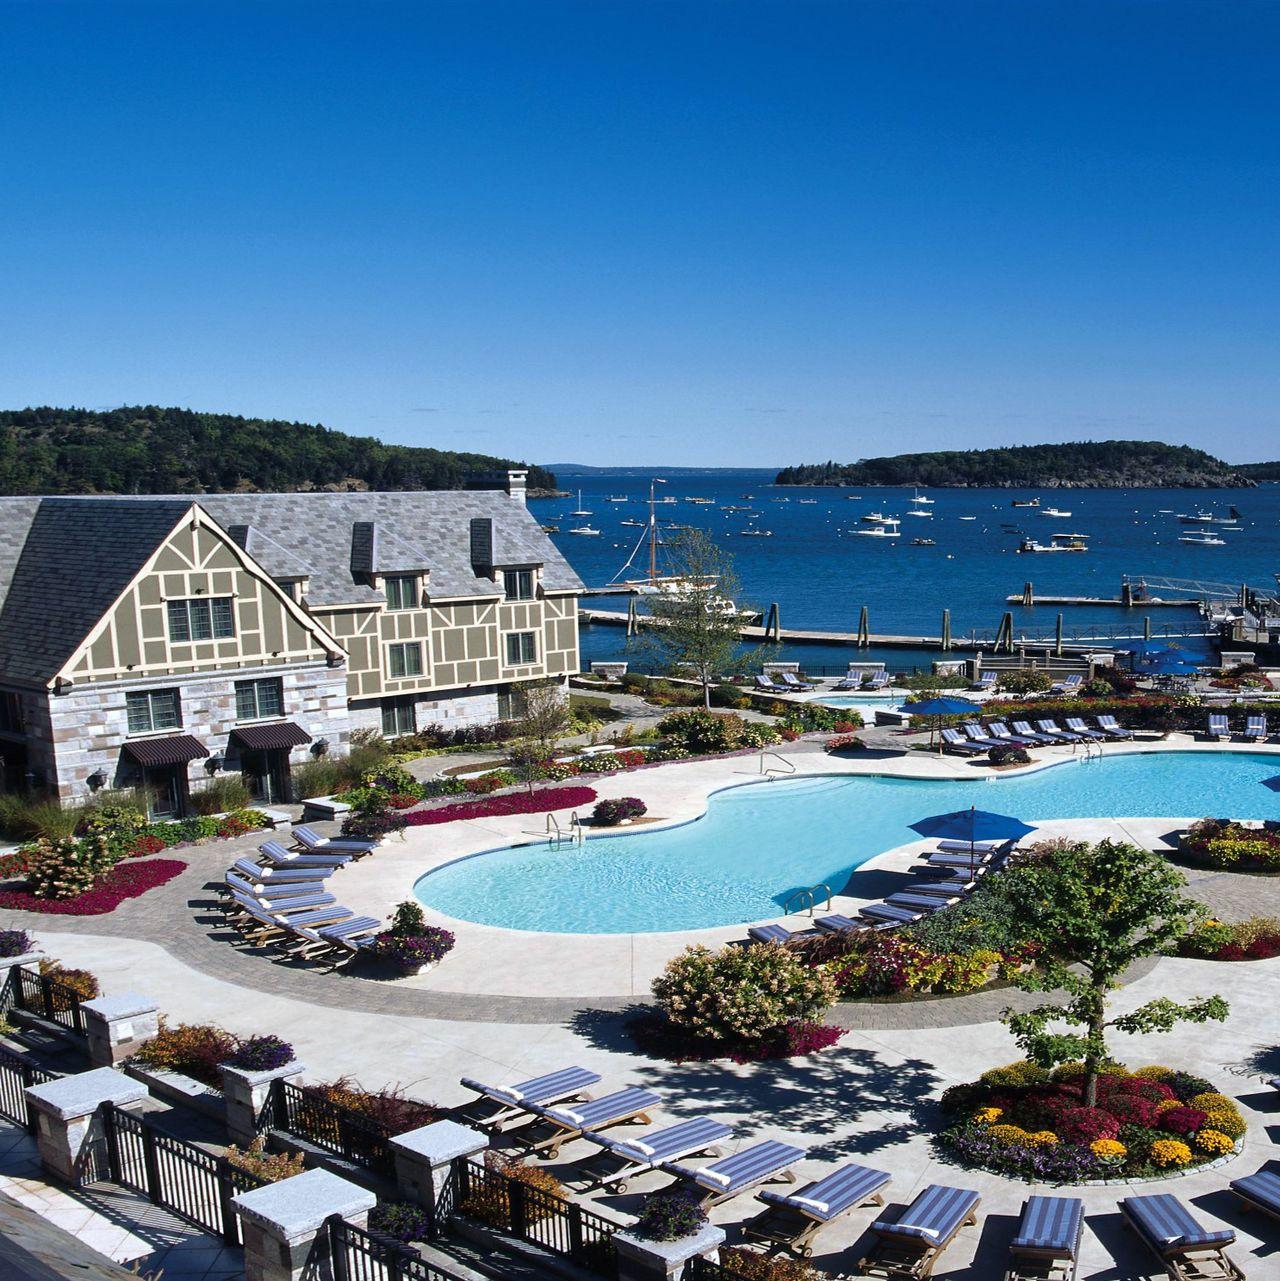 hotel maine harborside hotel marina canusa. Black Bedroom Furniture Sets. Home Design Ideas